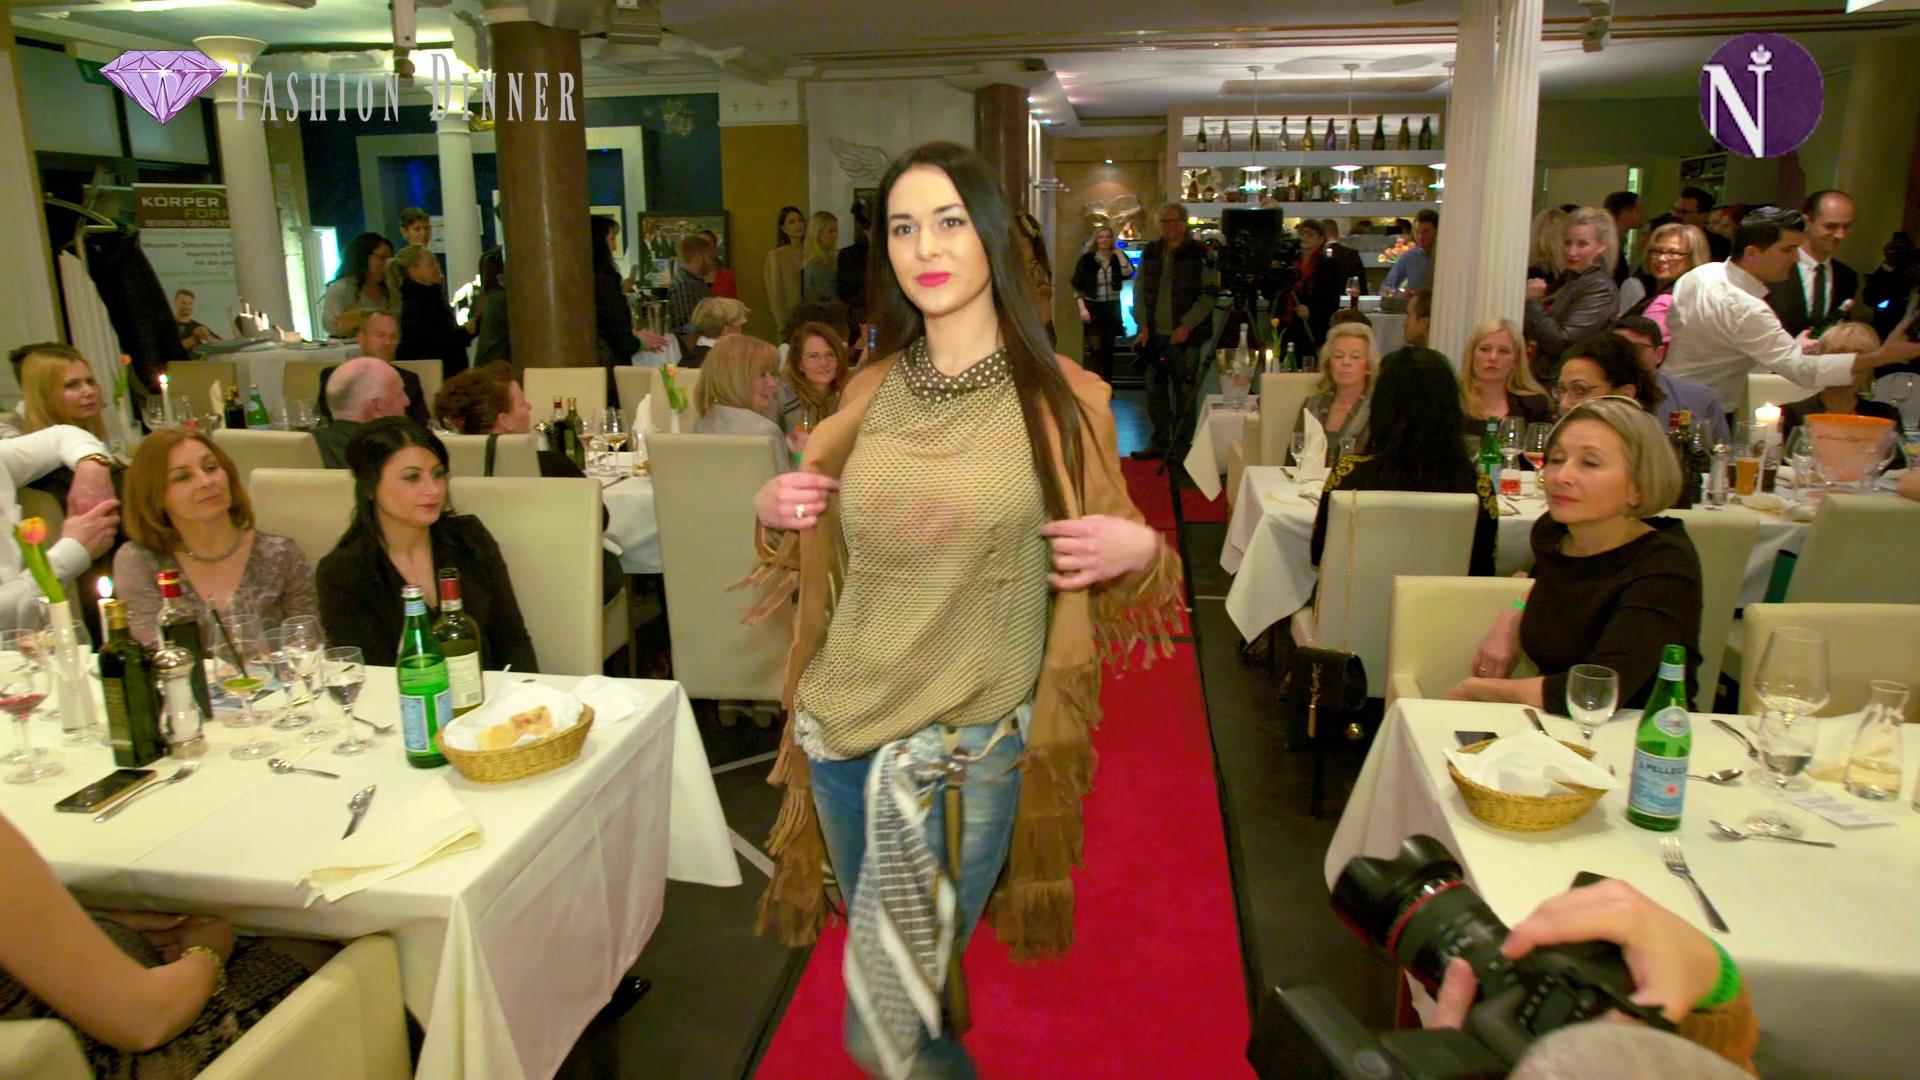 FASHION-DINNER | Nantia Persch